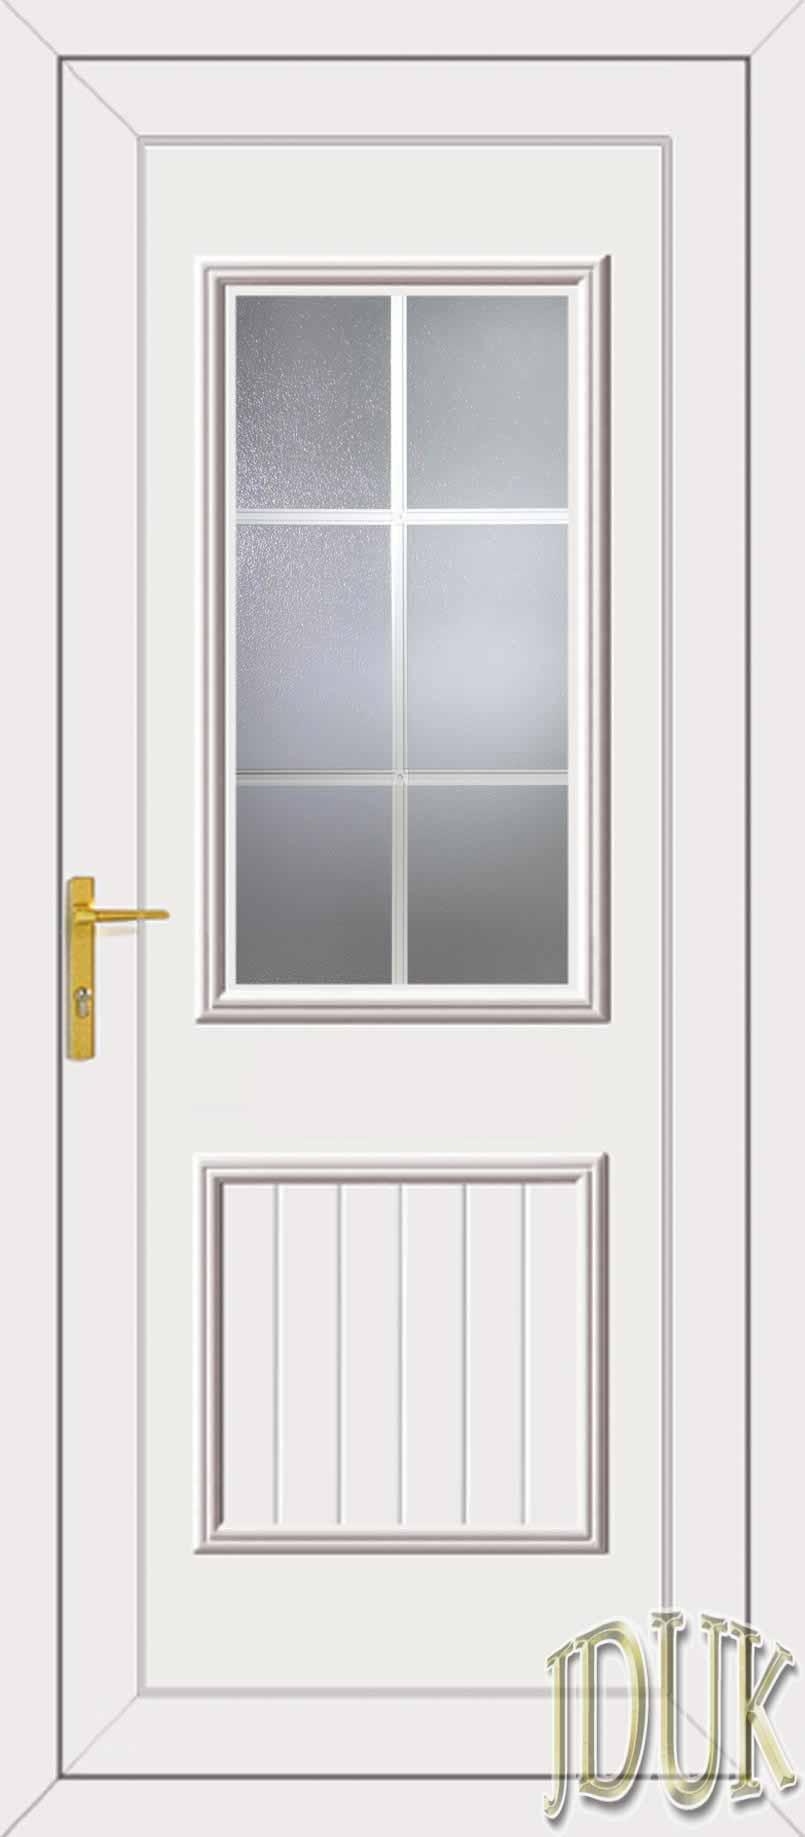 Chester one georgian bar upvc cottage door for Upvc french doors with georgian bar